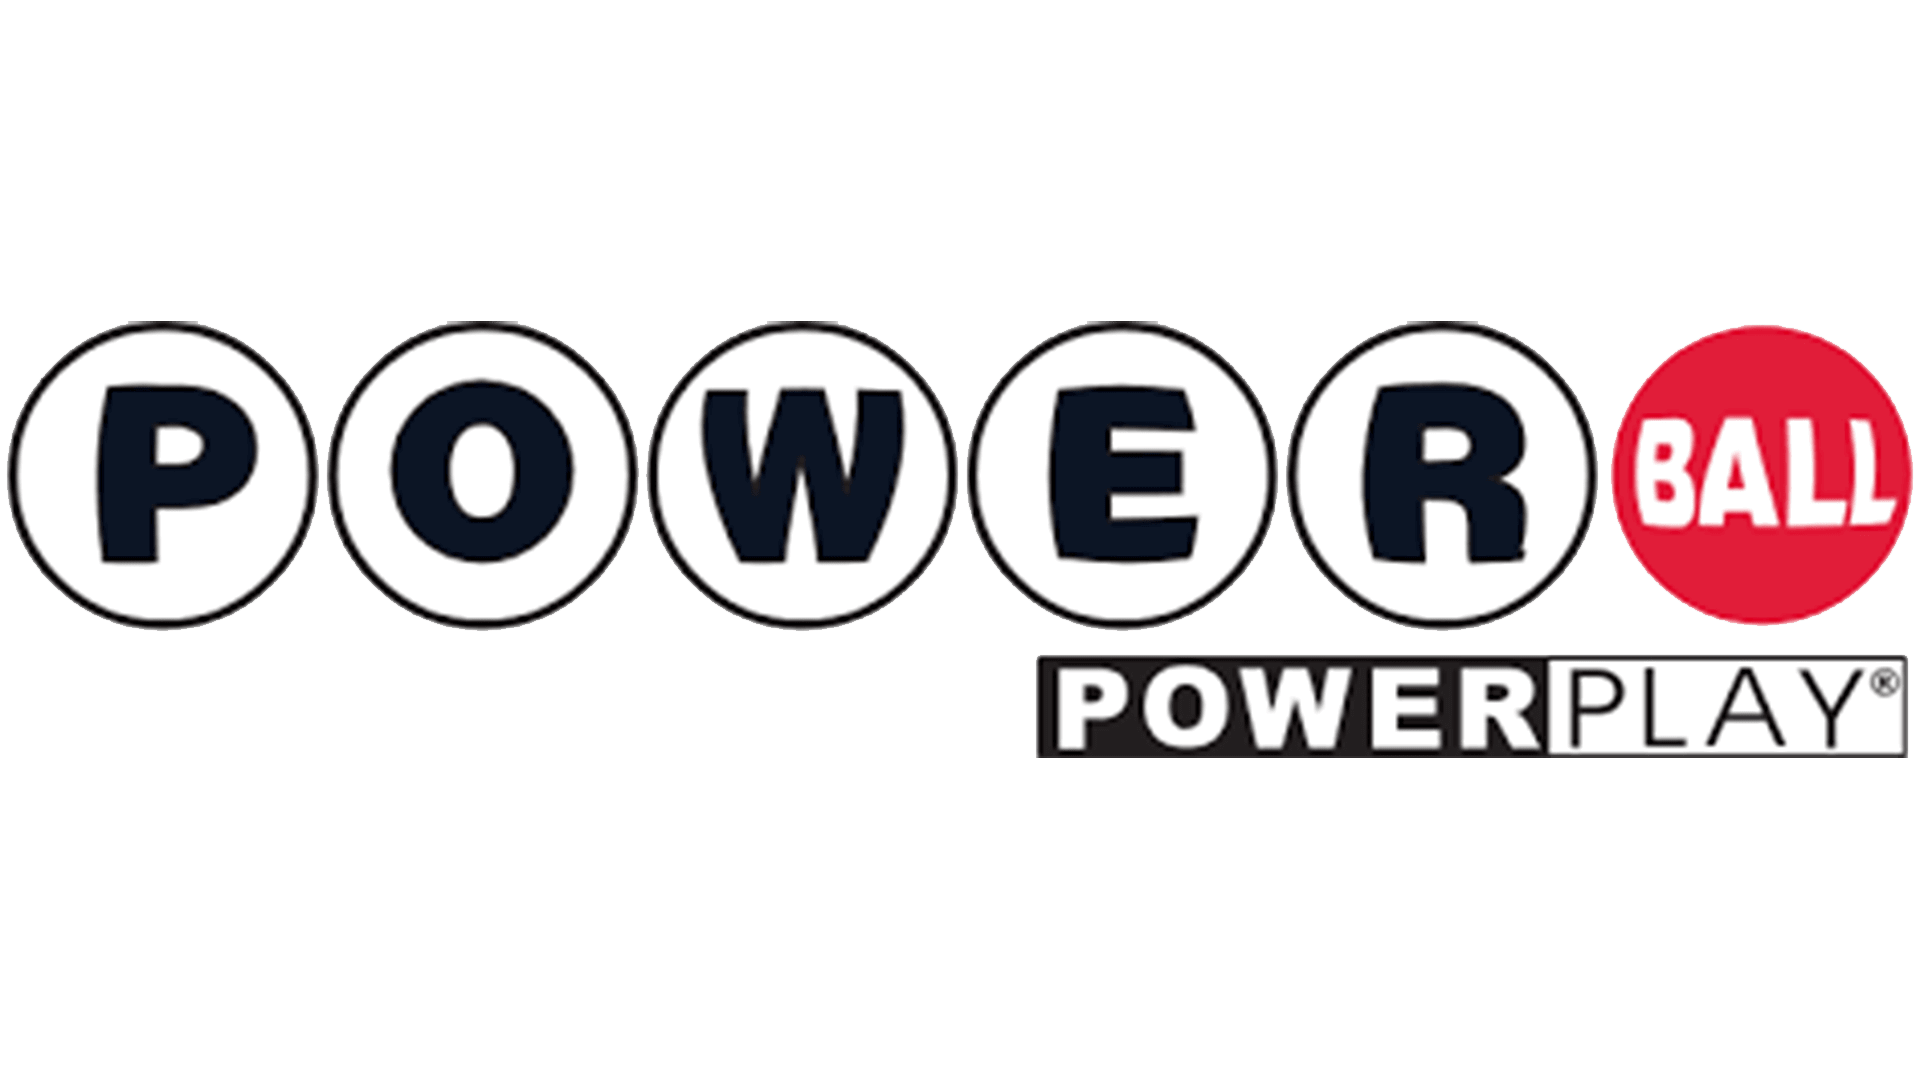 Powerball Online Buy